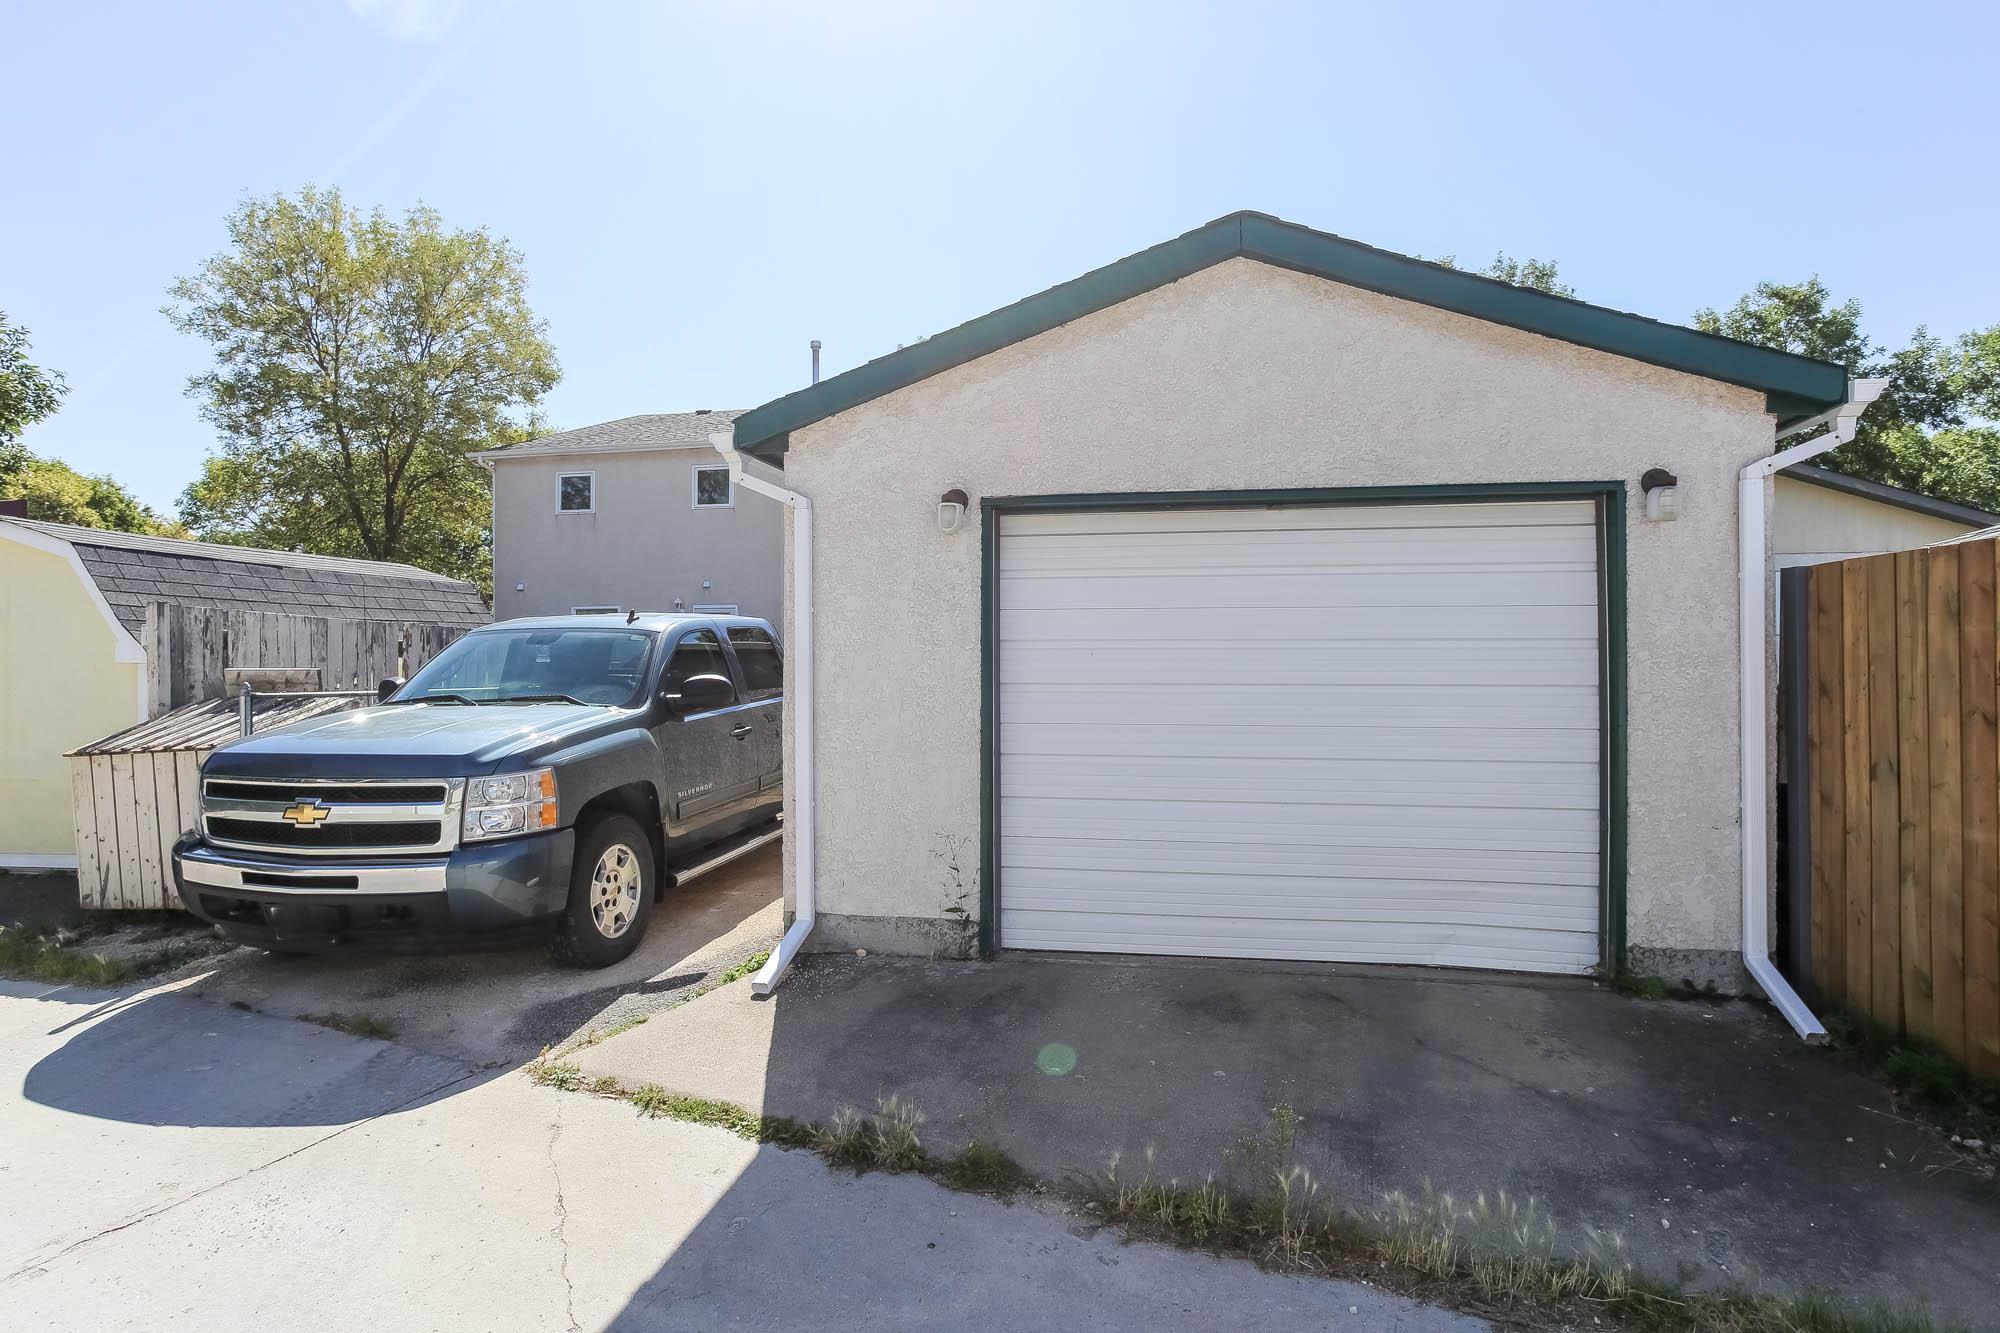 69 Carriage House Road, Winnipeg, Manitoba  R2N 2J5 - Photo 26 - 202020700